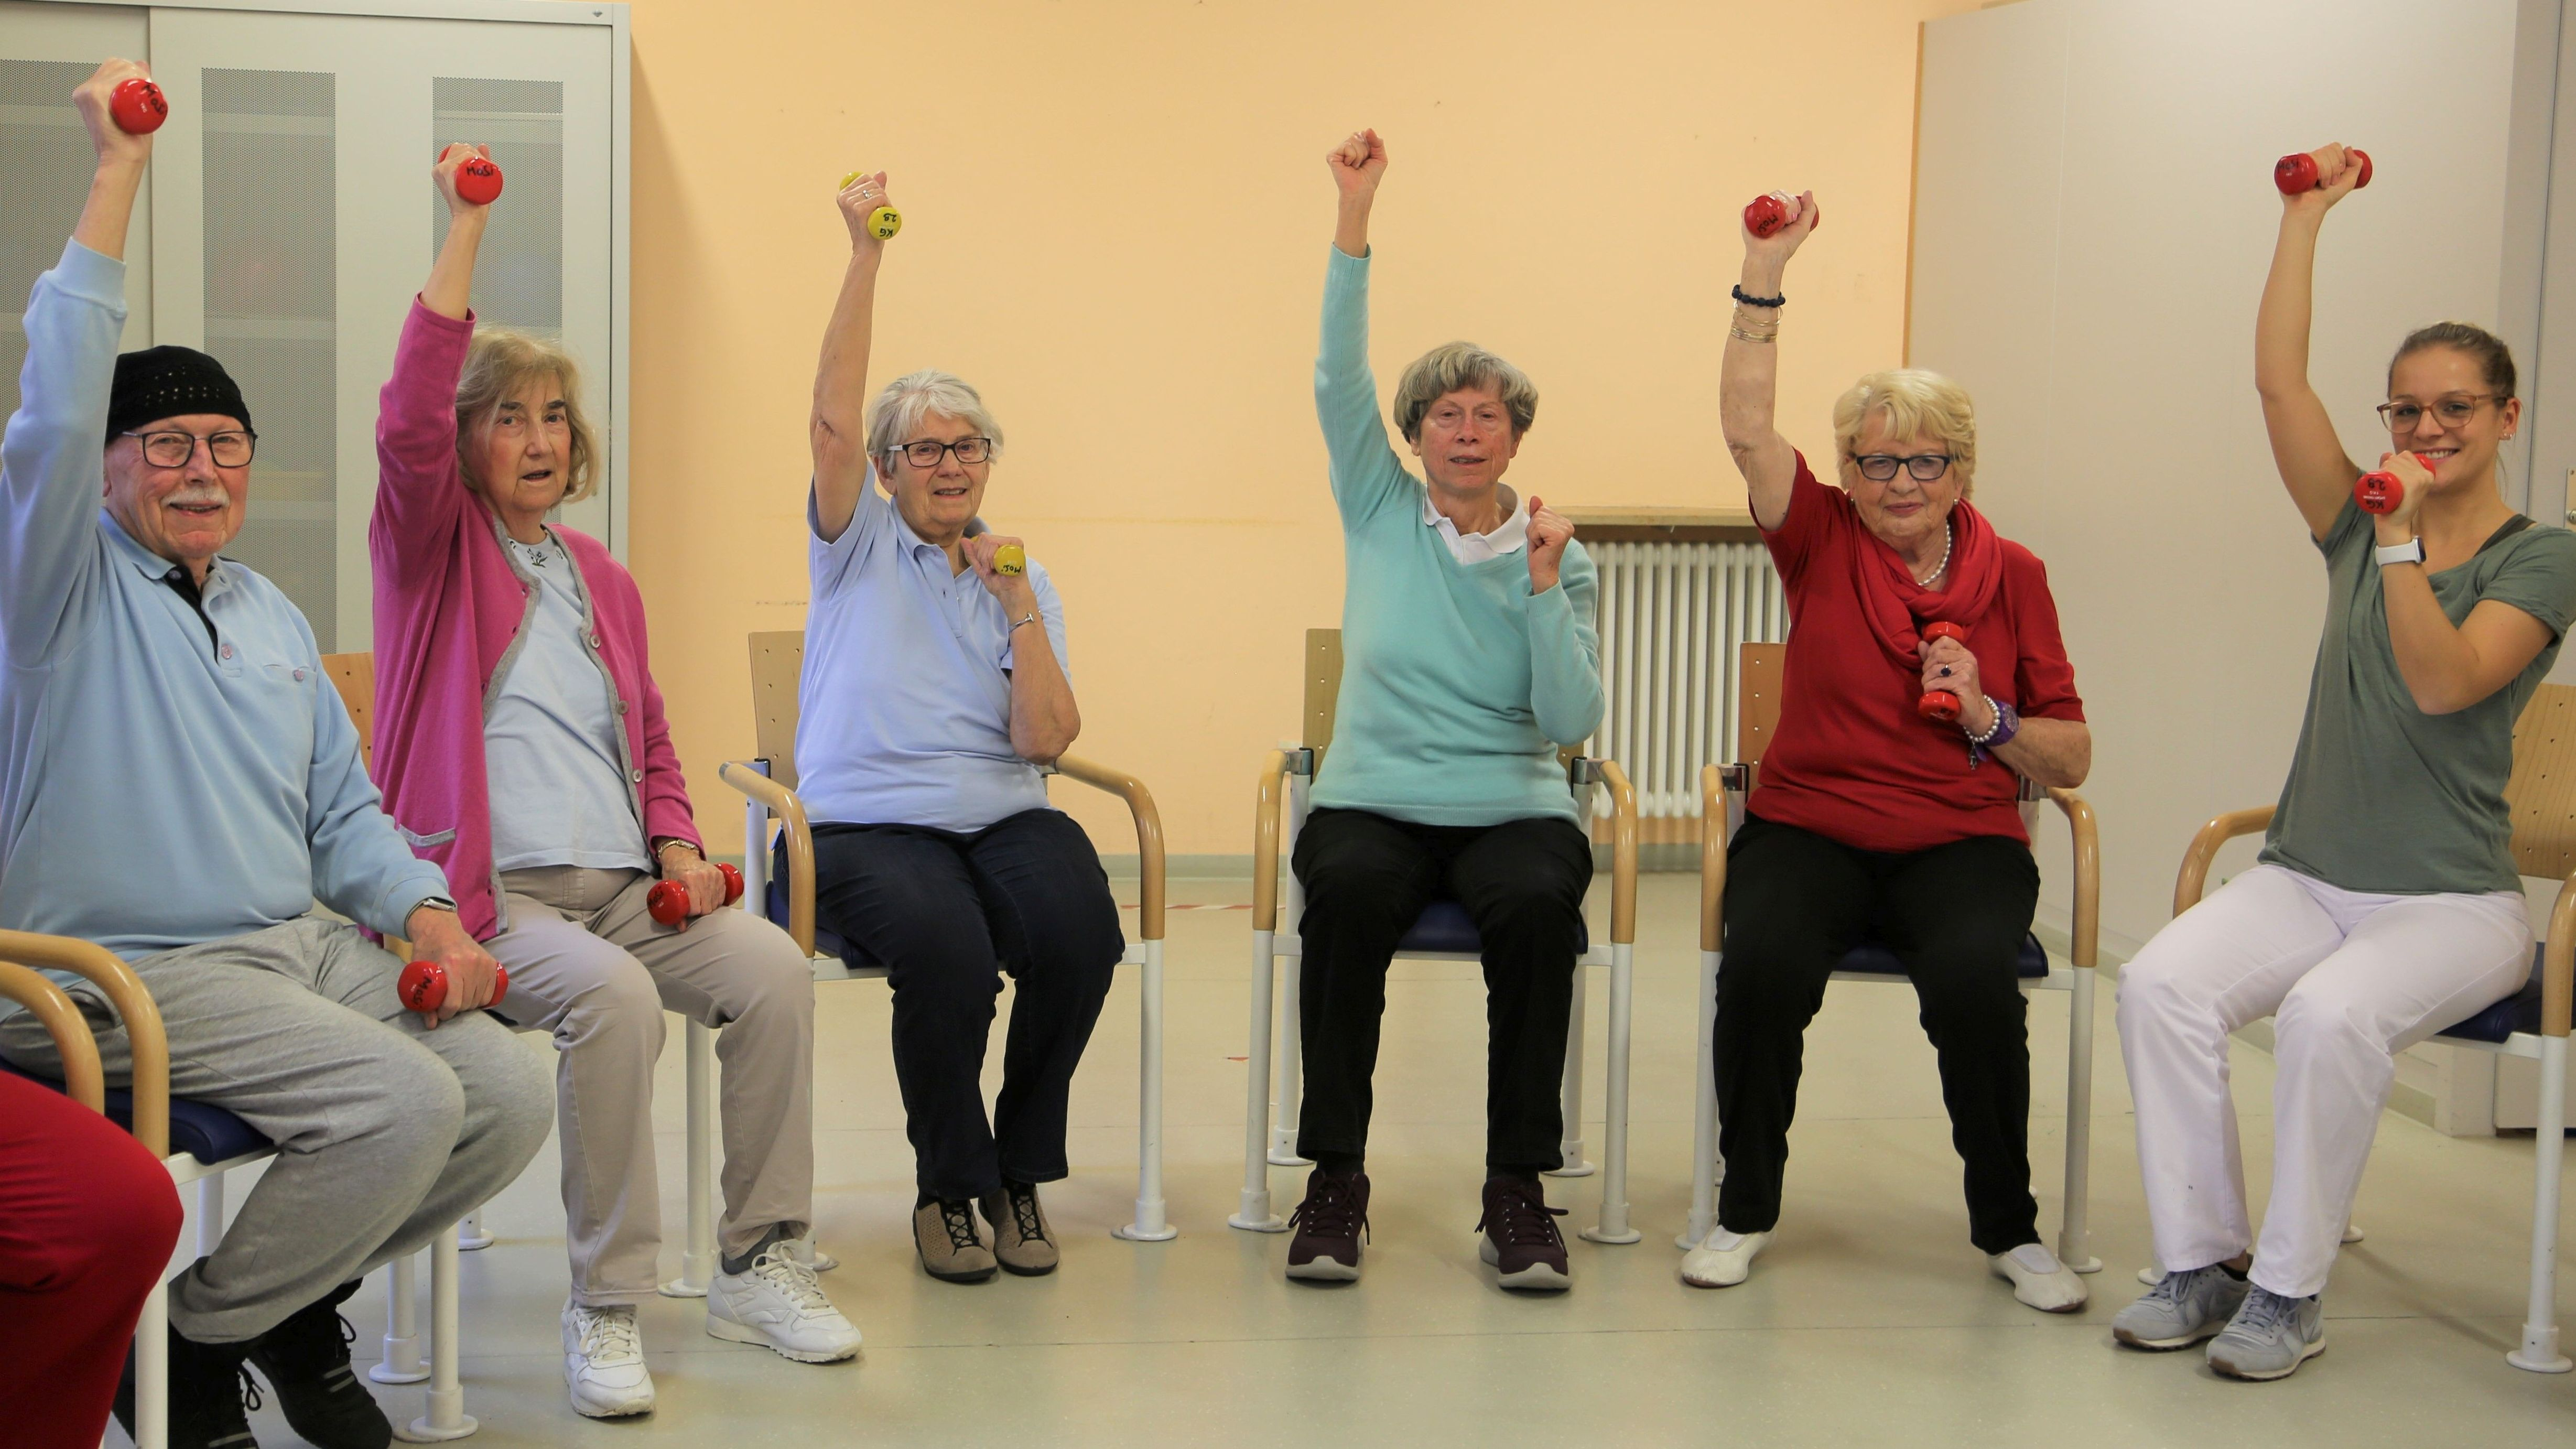 Senioren beim MoSi-Training am Erlanger Malteser Waldkrankenhaus St. Marien